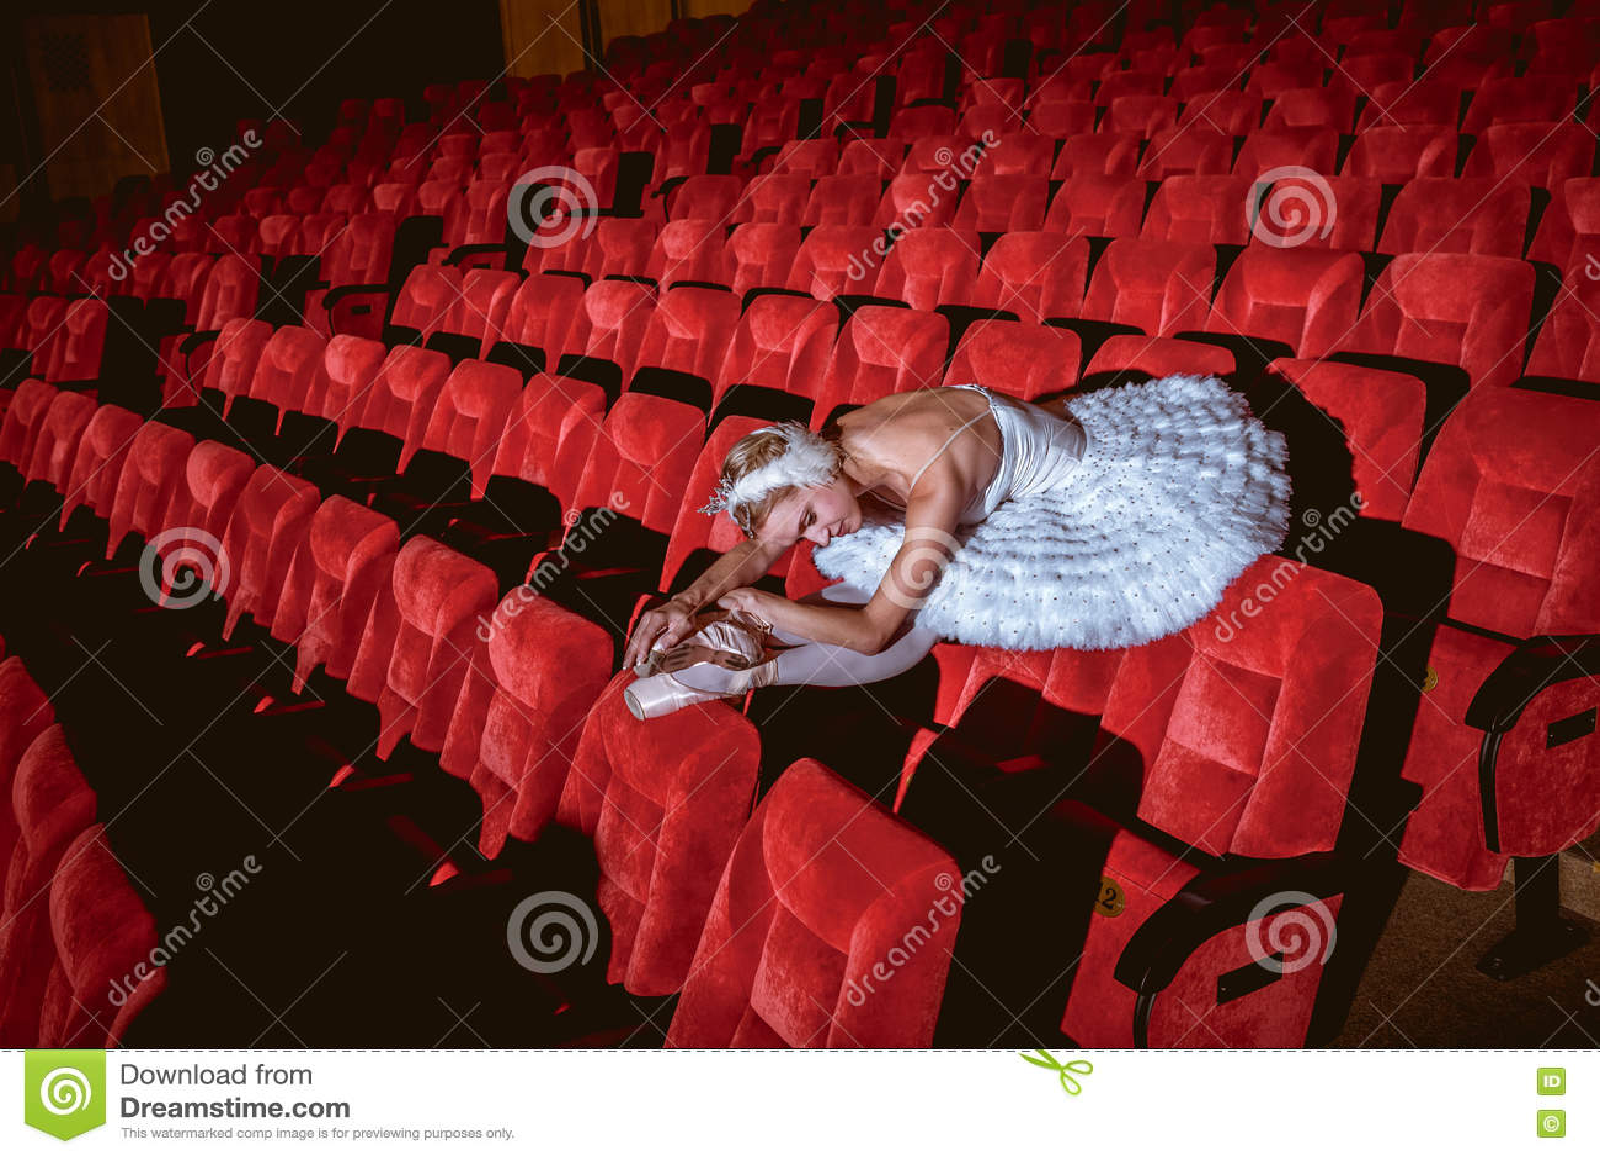 Ballerinazitting in het lege auditoriumtheater